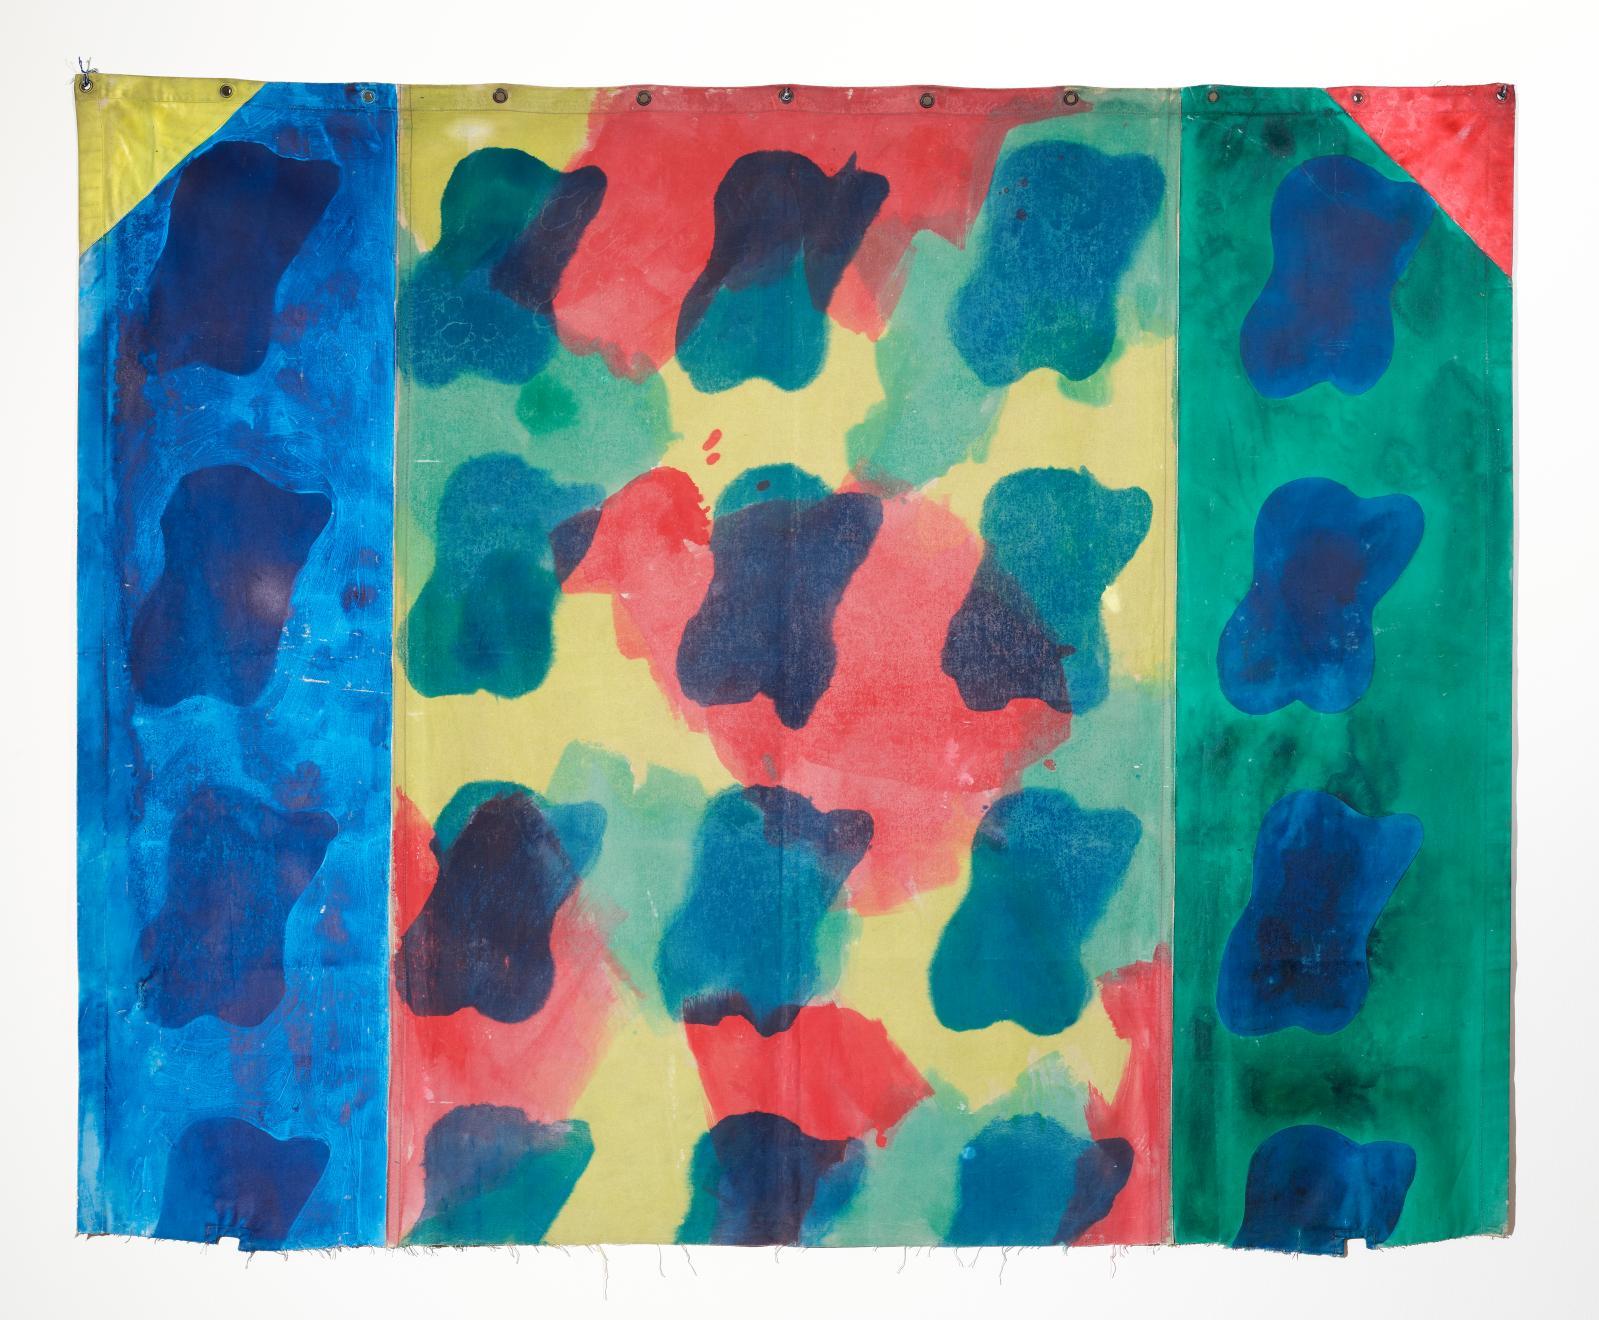 Claude Viallat (b. 1936), Untitled, 1976, Acrylic on tarpaulin. Image courtesy of MNHA, Luxembourg © Adagp, Paris, 2021